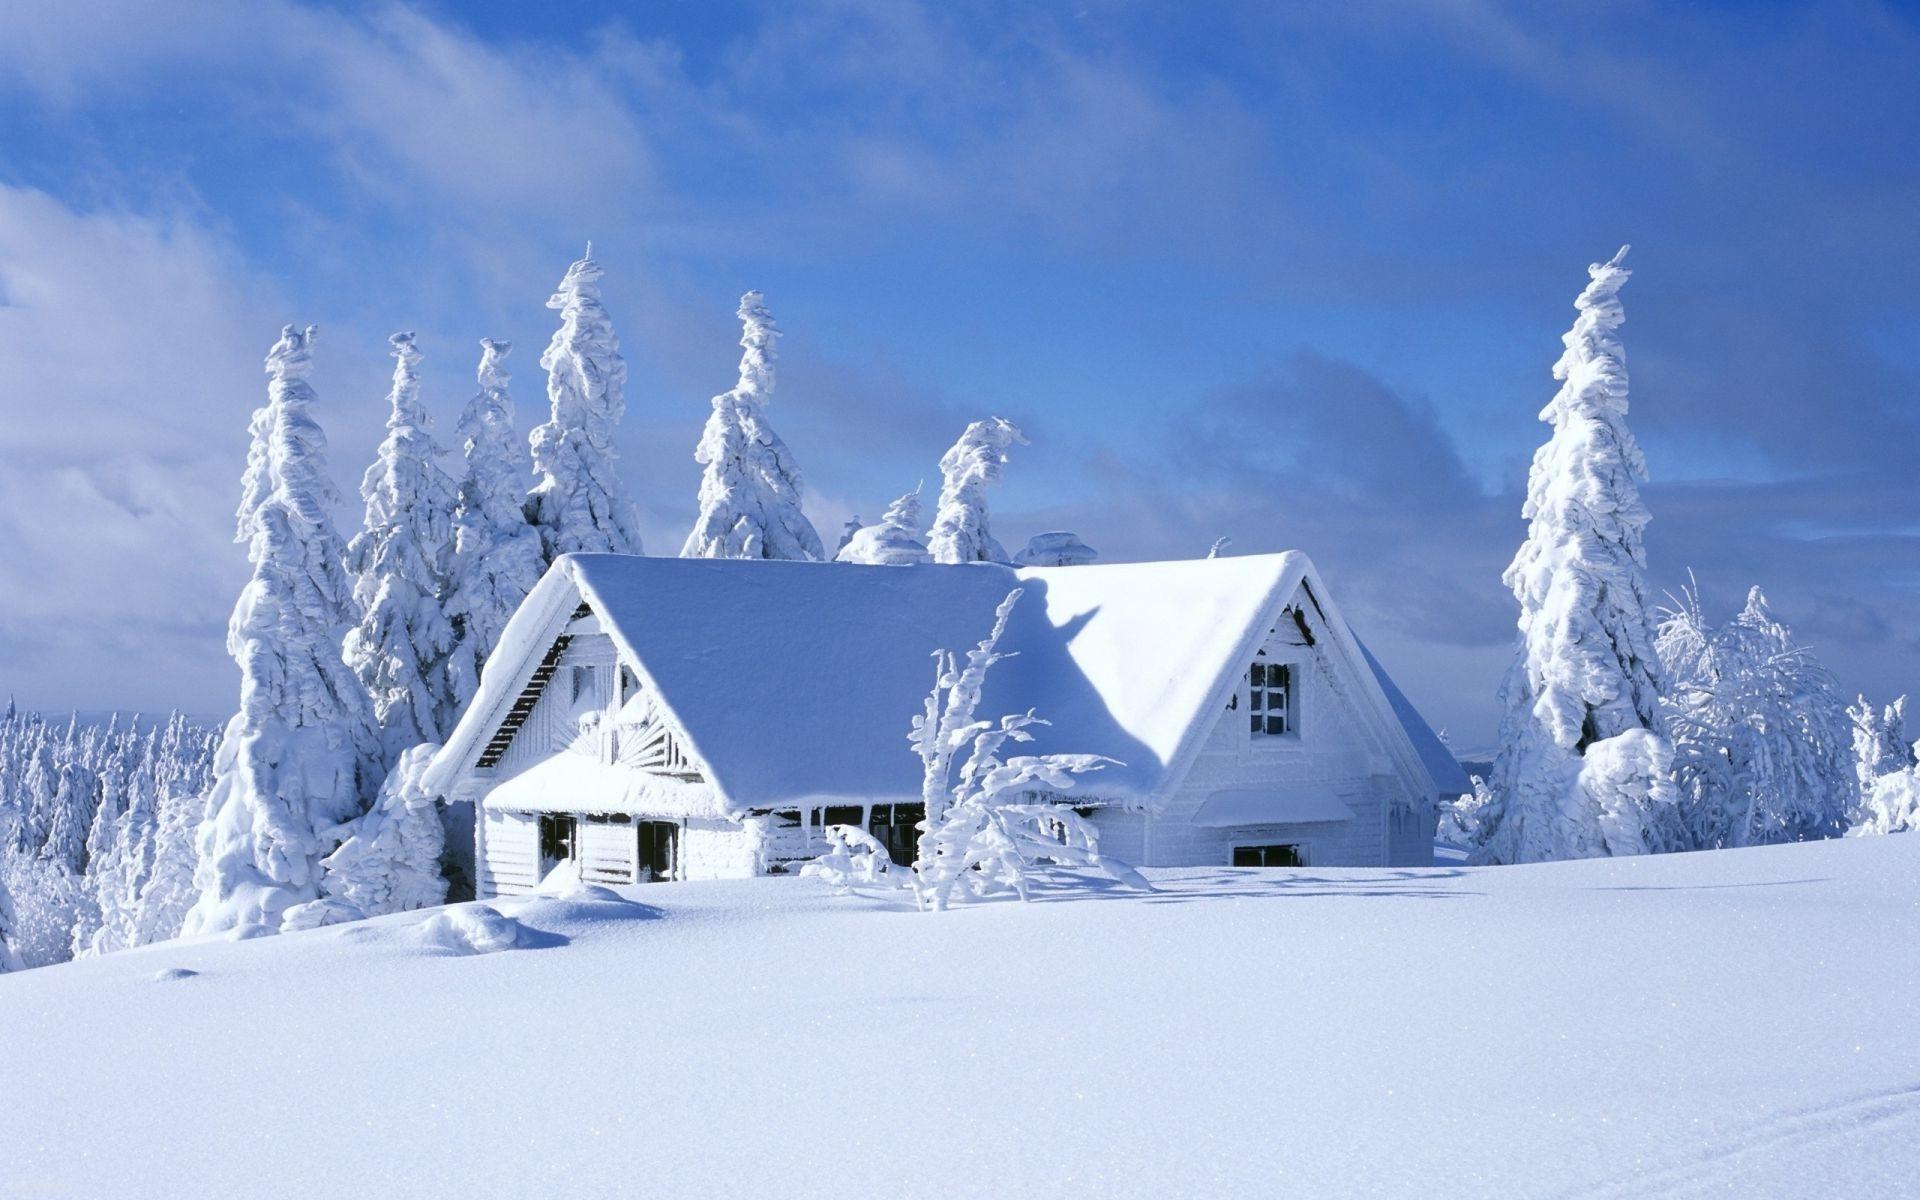 фотографии картинки зима снег на рабочий стол посмеялись, над